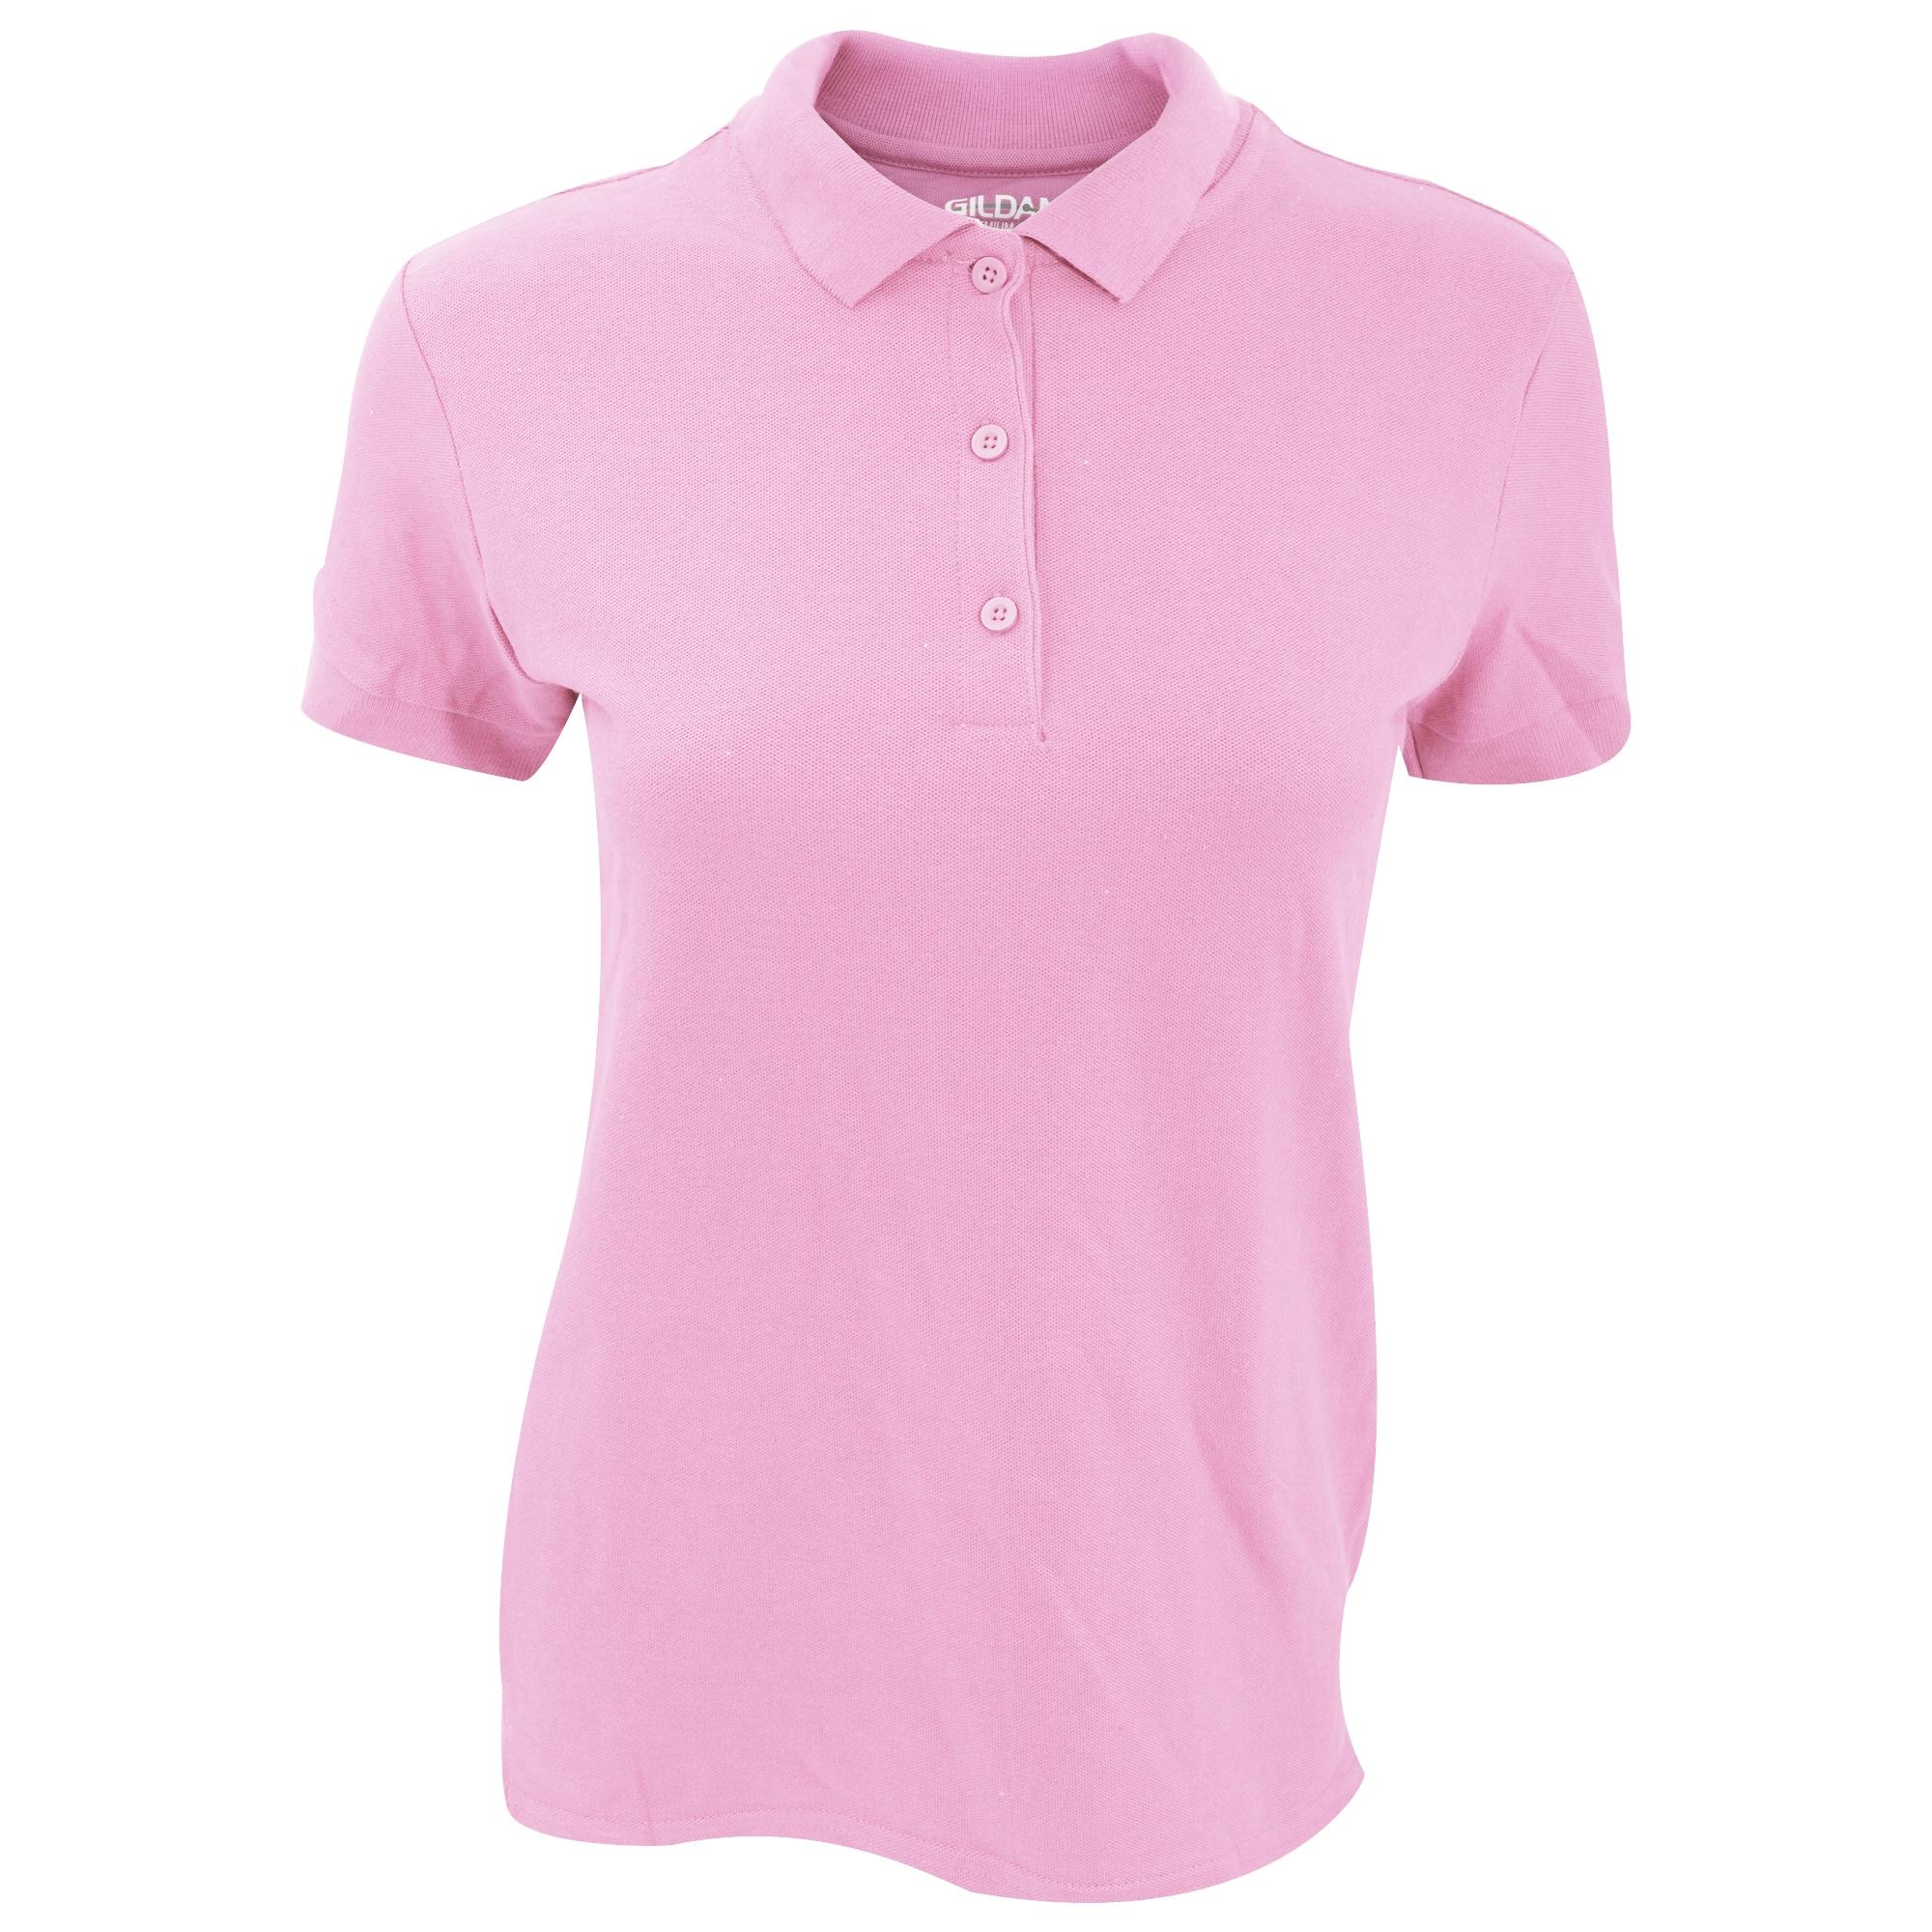 gildan -  Poloshirt Damen Premium Polo-Shirt, Kurzarm